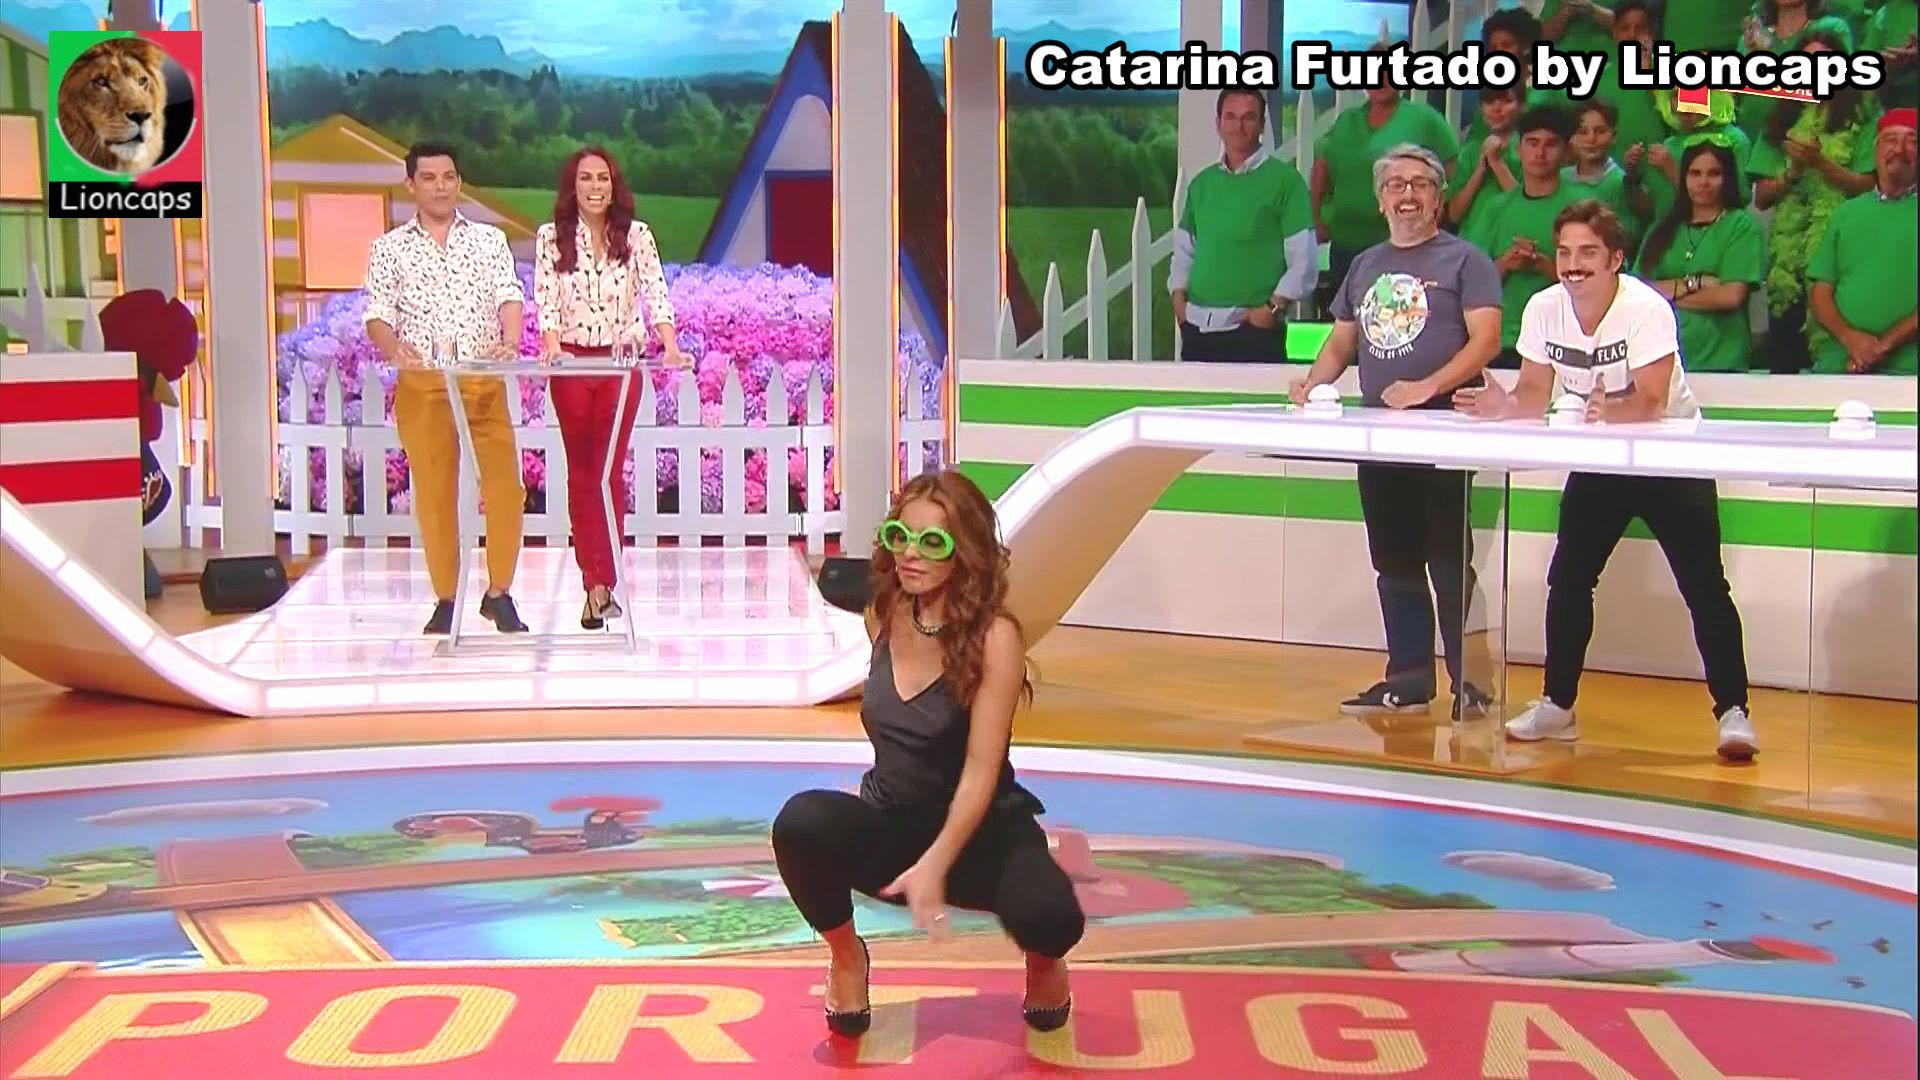 796320487_catarina_furtado_vs200122_0011_122_572lo.JPG